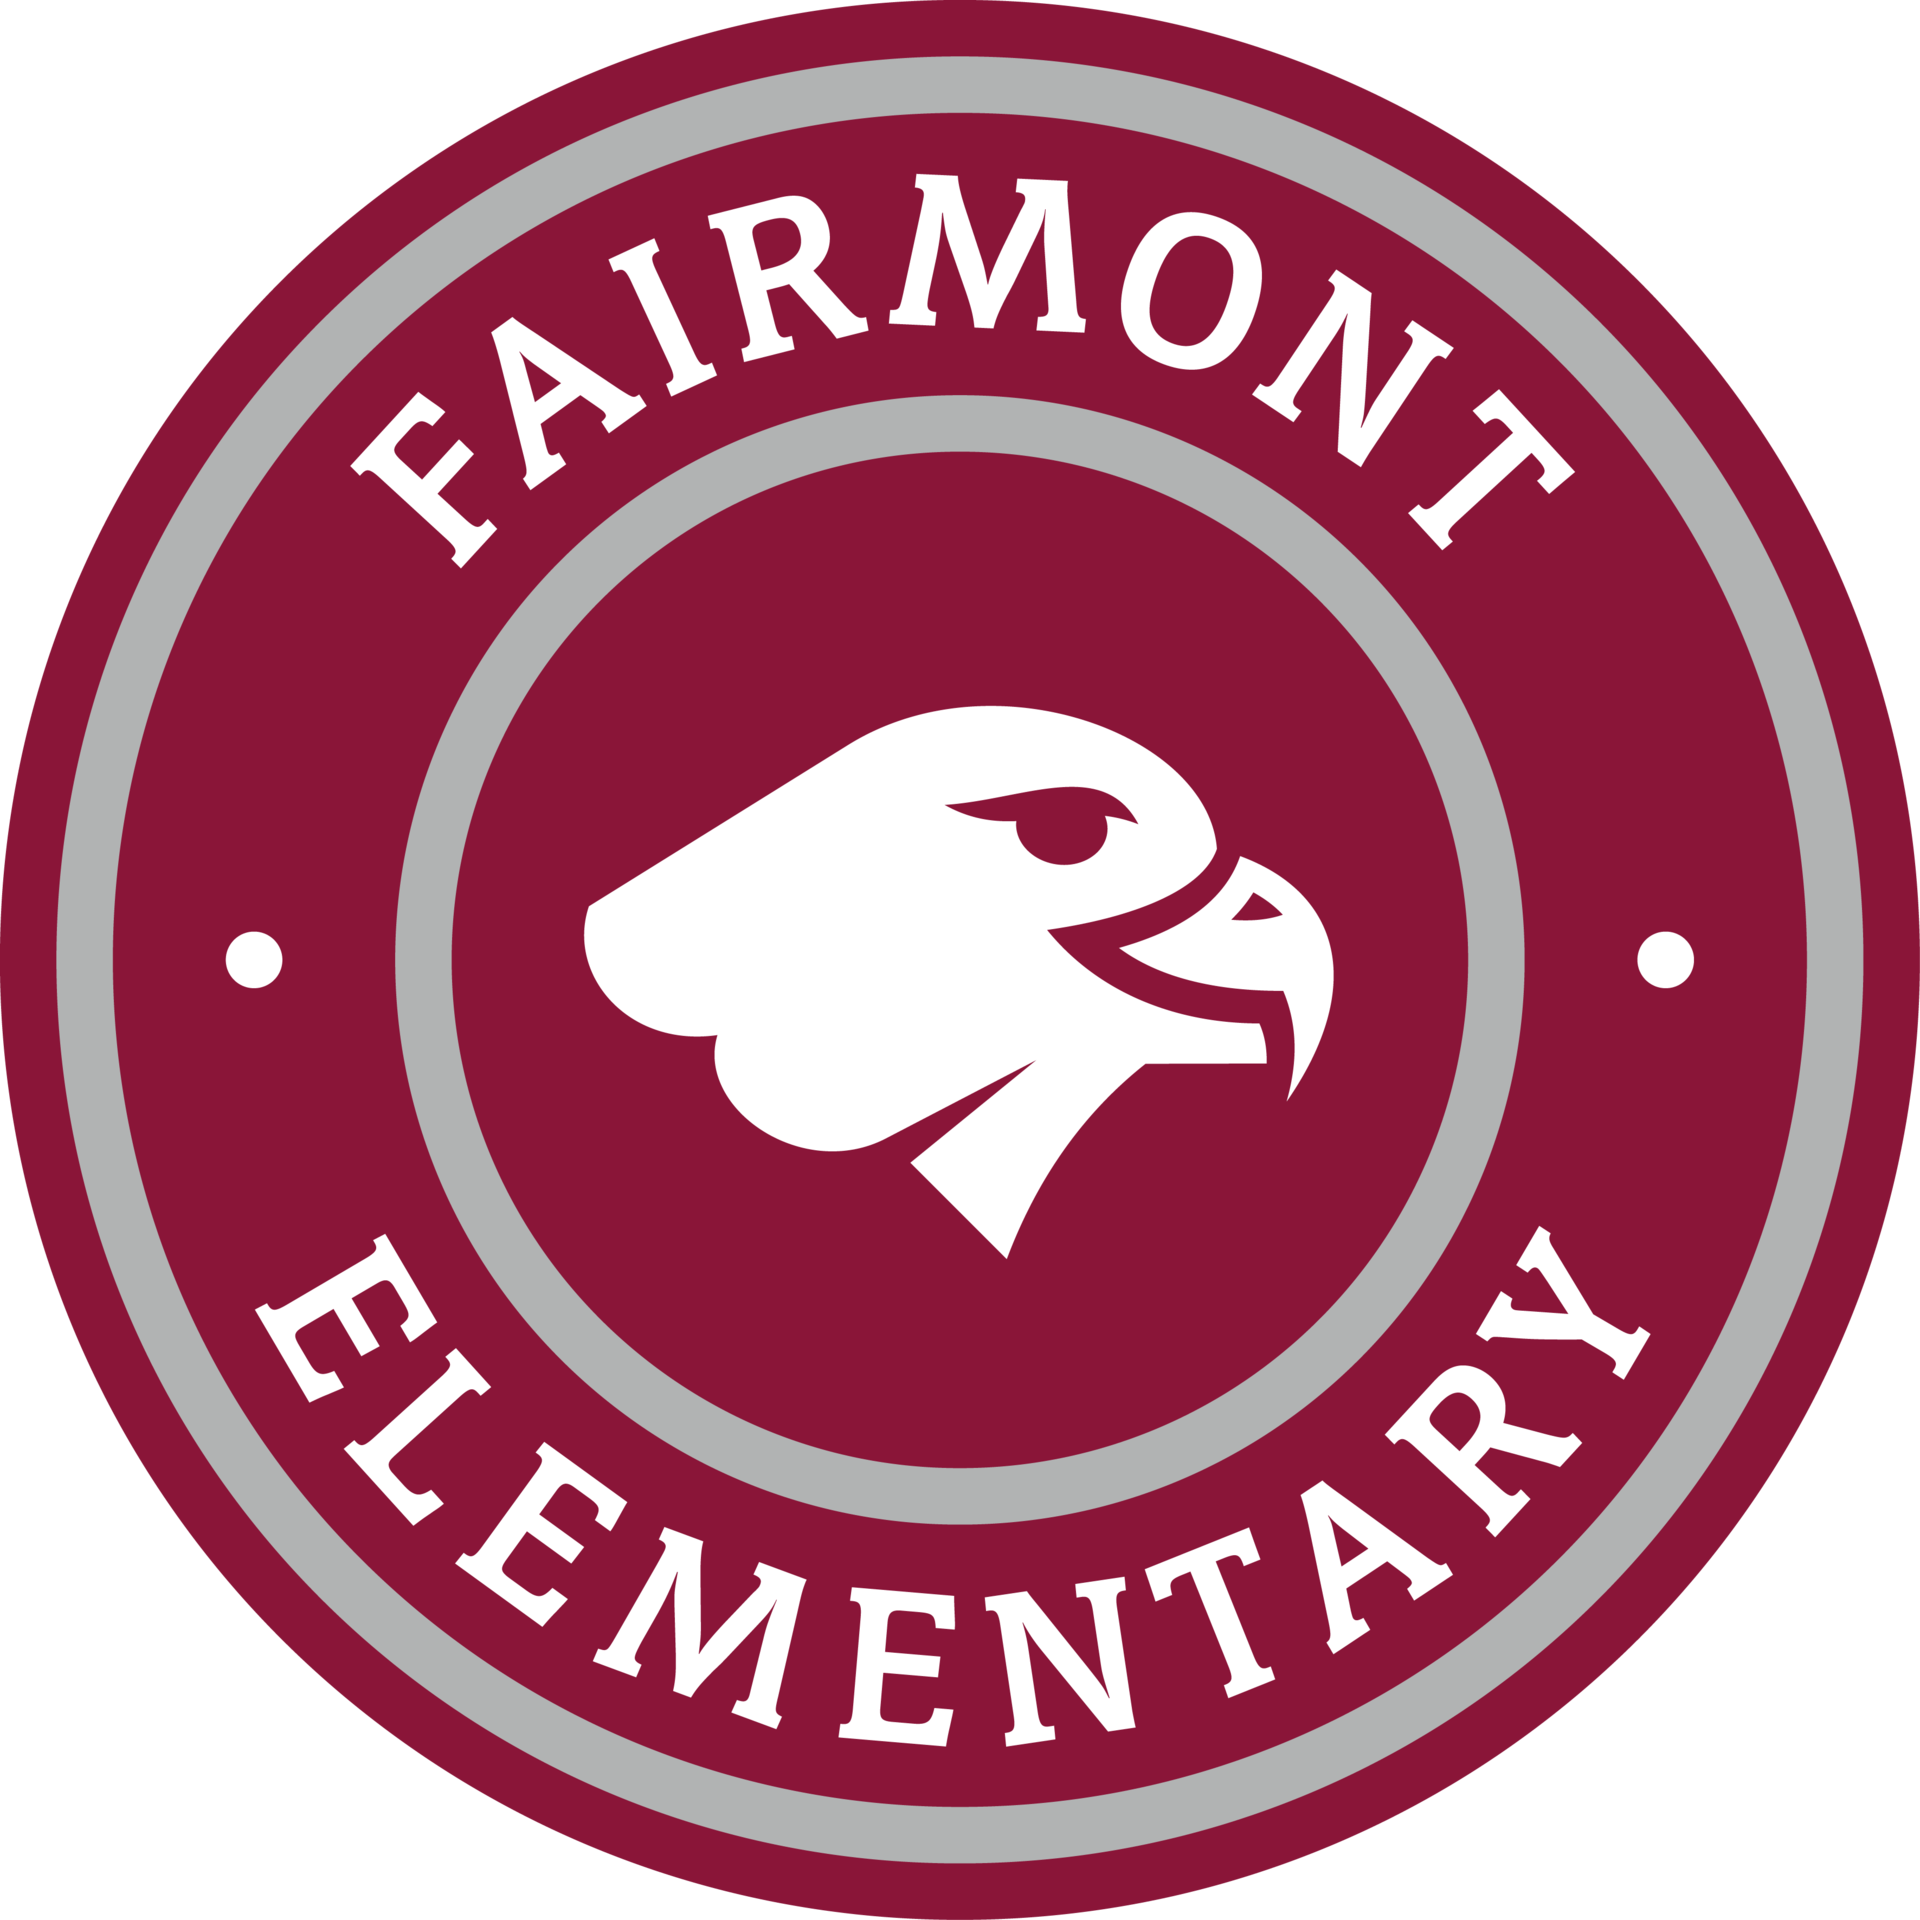 Fairmont Elementary school seal